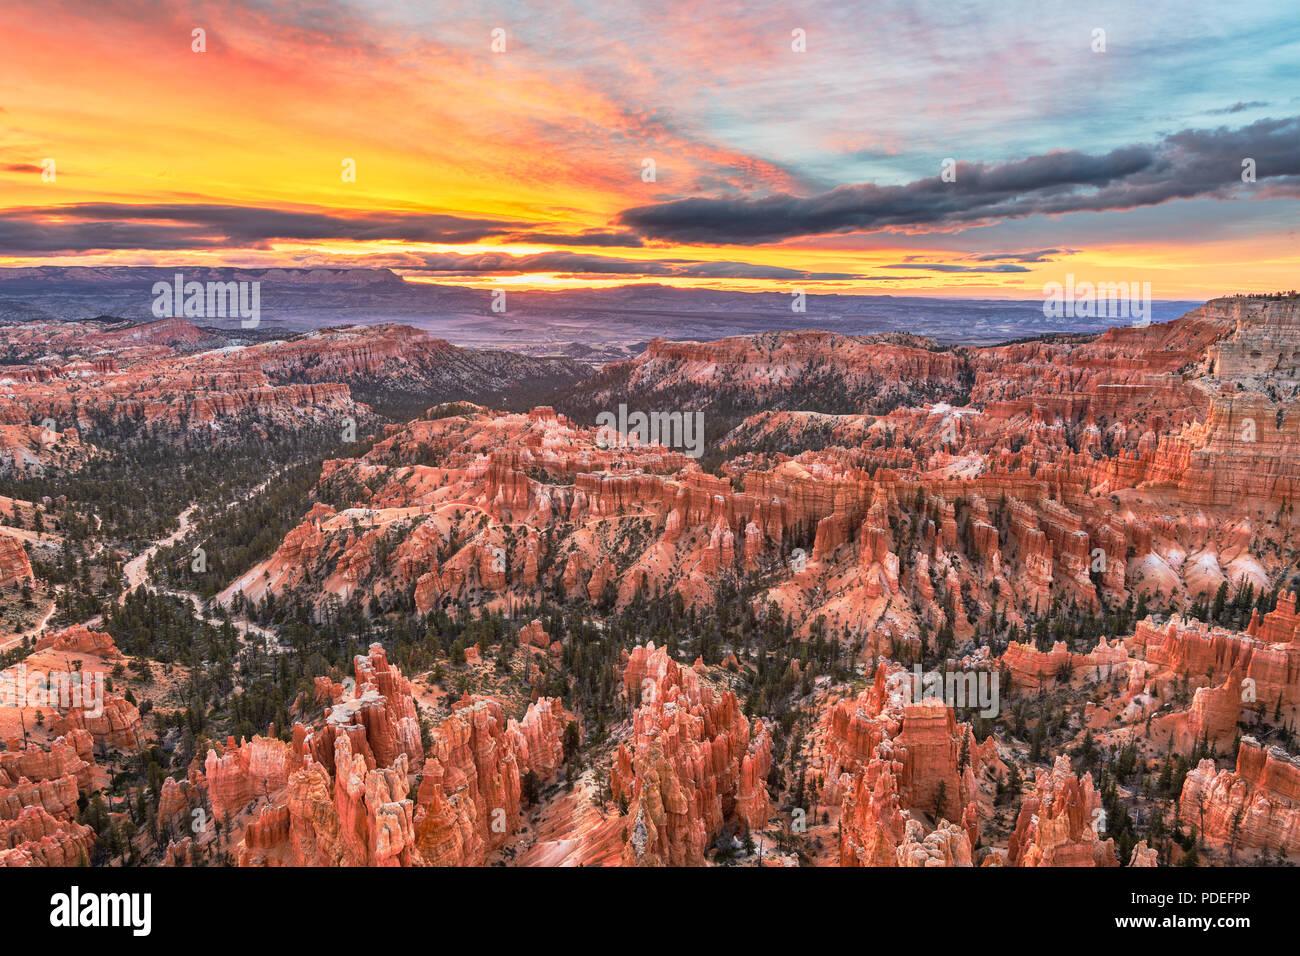 Bryce Canyon National Park, Utah, USA à l'aube. Photo Stock